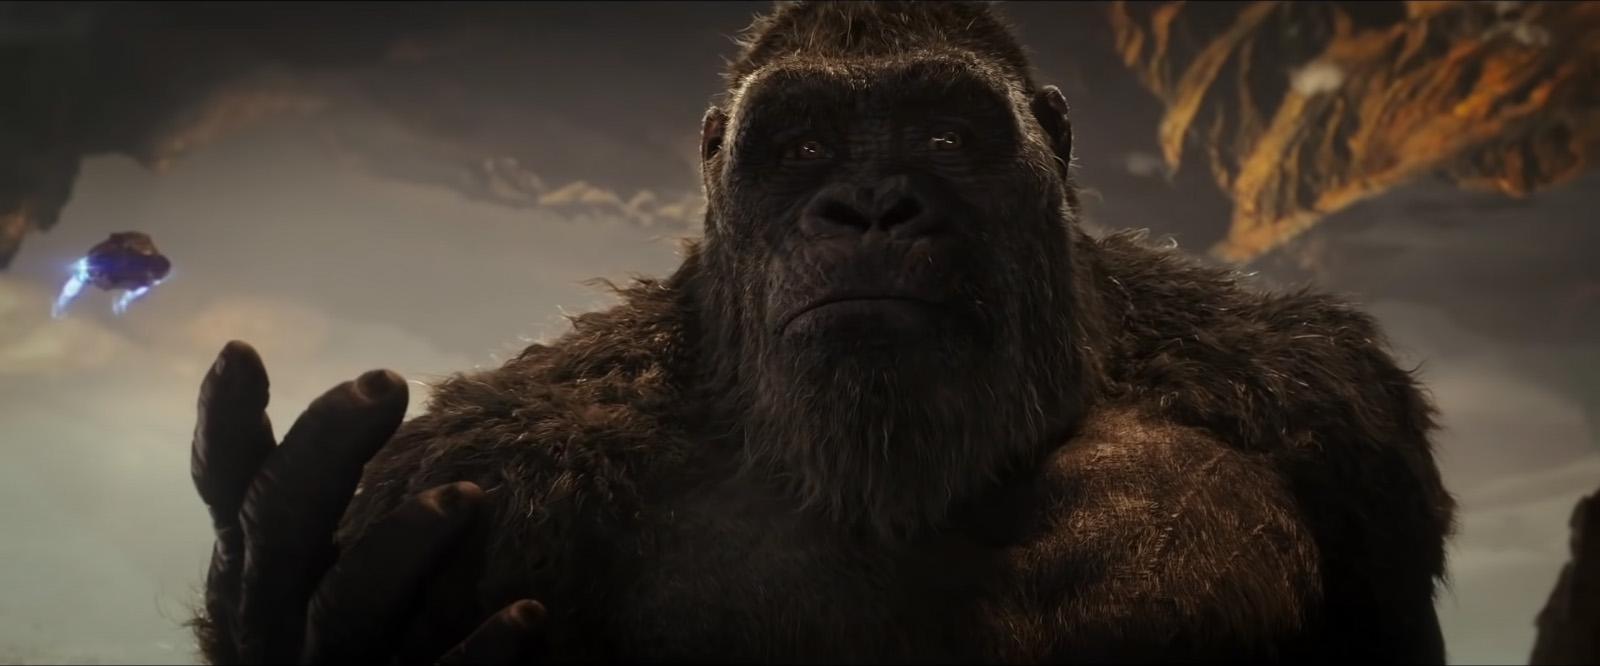 Kong.jpg